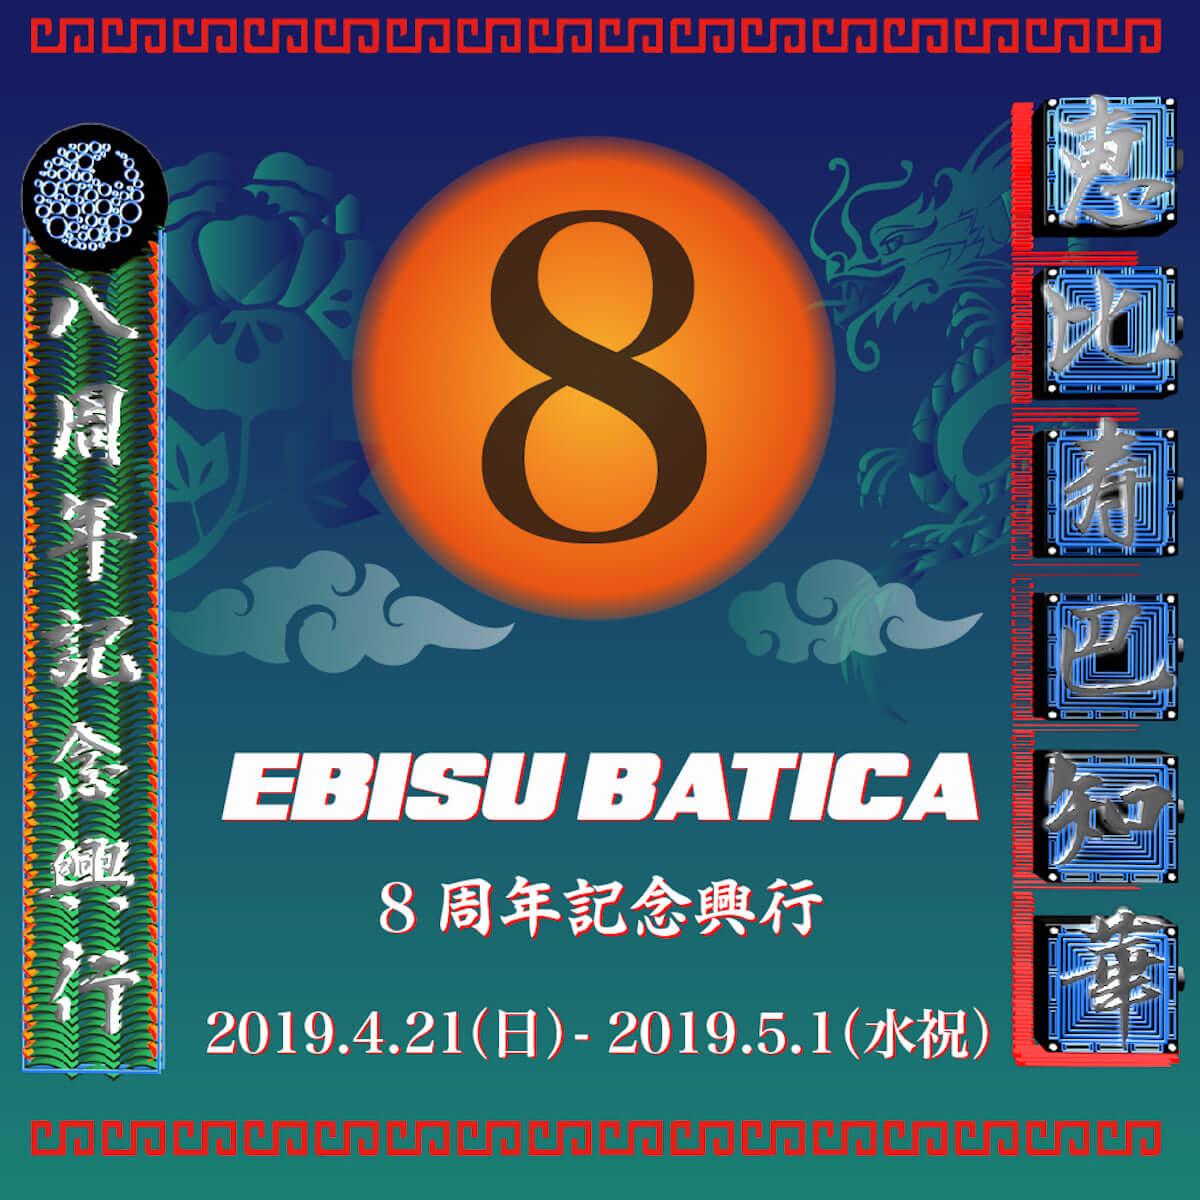 ELLE TERESAやTohji、Omega Sapienが登場|「Typhoon Eye」が恵比寿BATICAの8周年記念興行にて開催 music190417-ebisu-batica-8th-anniversary-tv-1-1200x1200